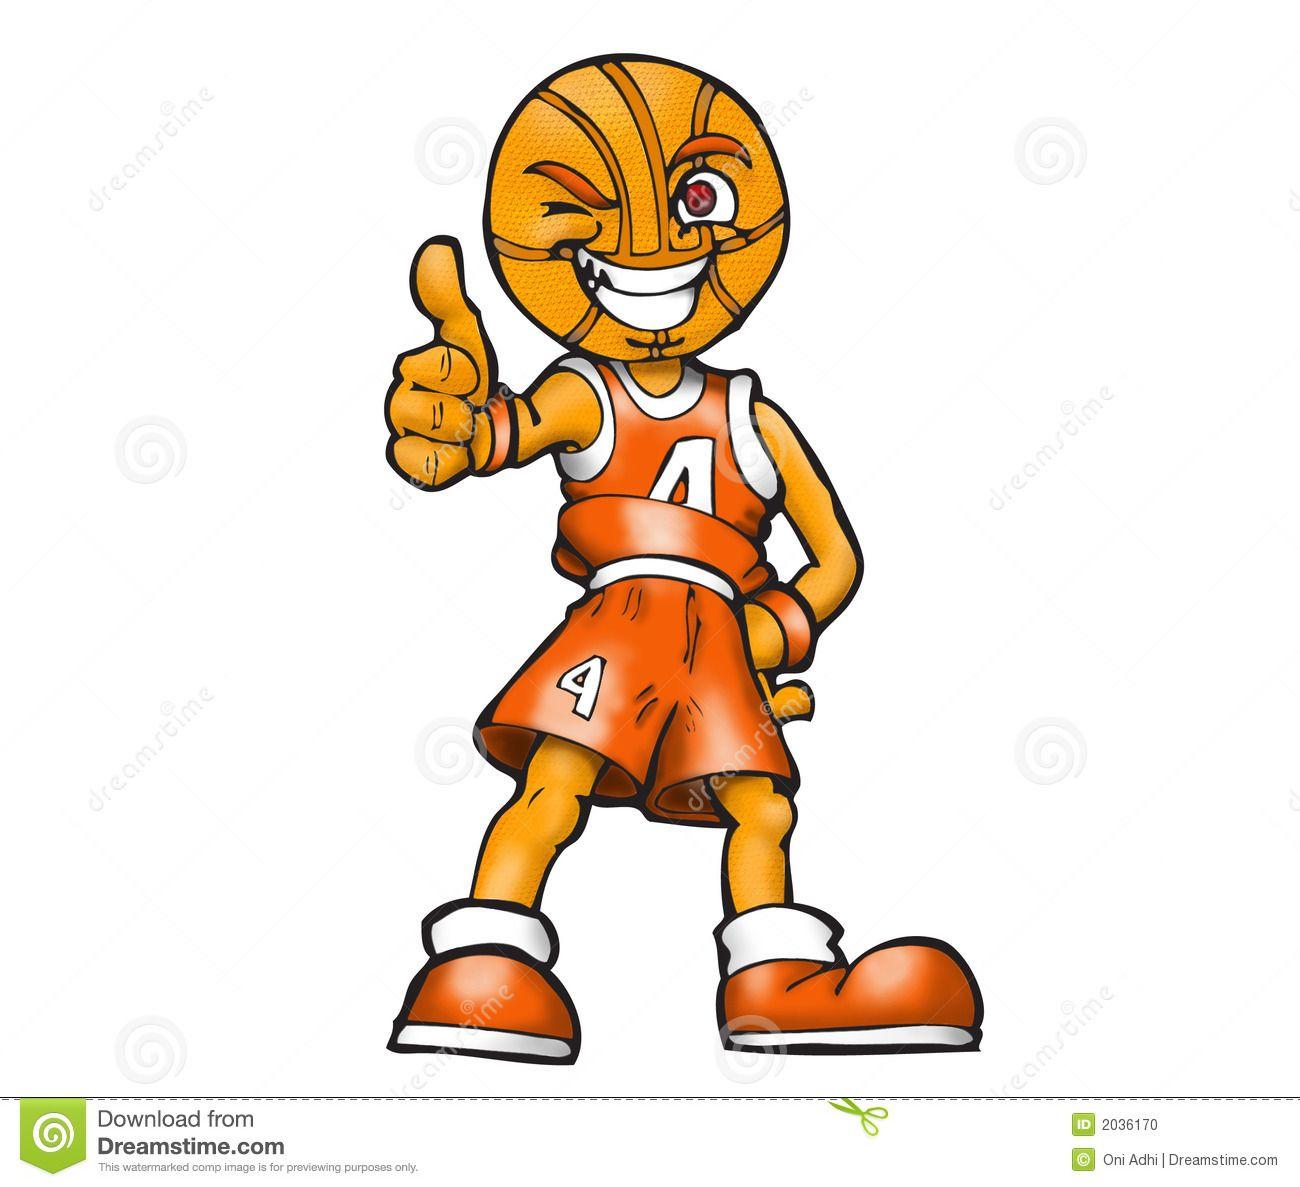 Cartoon Basketball Cartoon Basketball Player 2036170 Jpg Basketball Players Cartoon Clip Art Cartoon